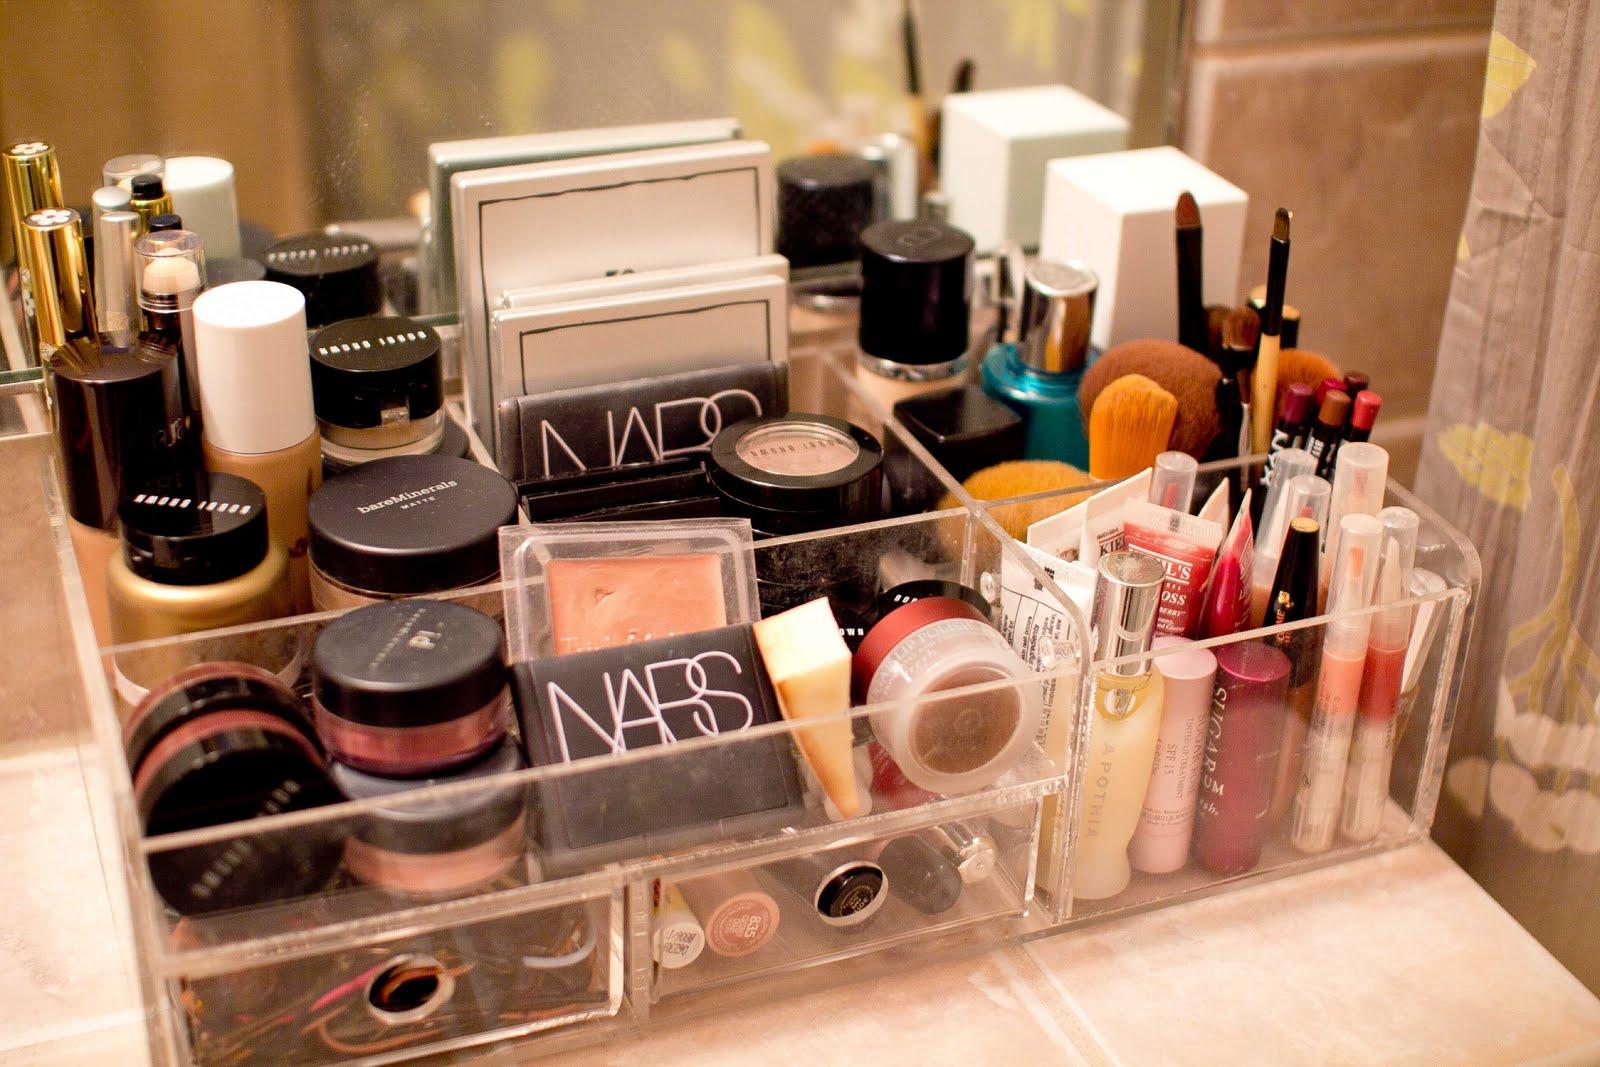 Makeup-Organizer-Ideas-Tumblr